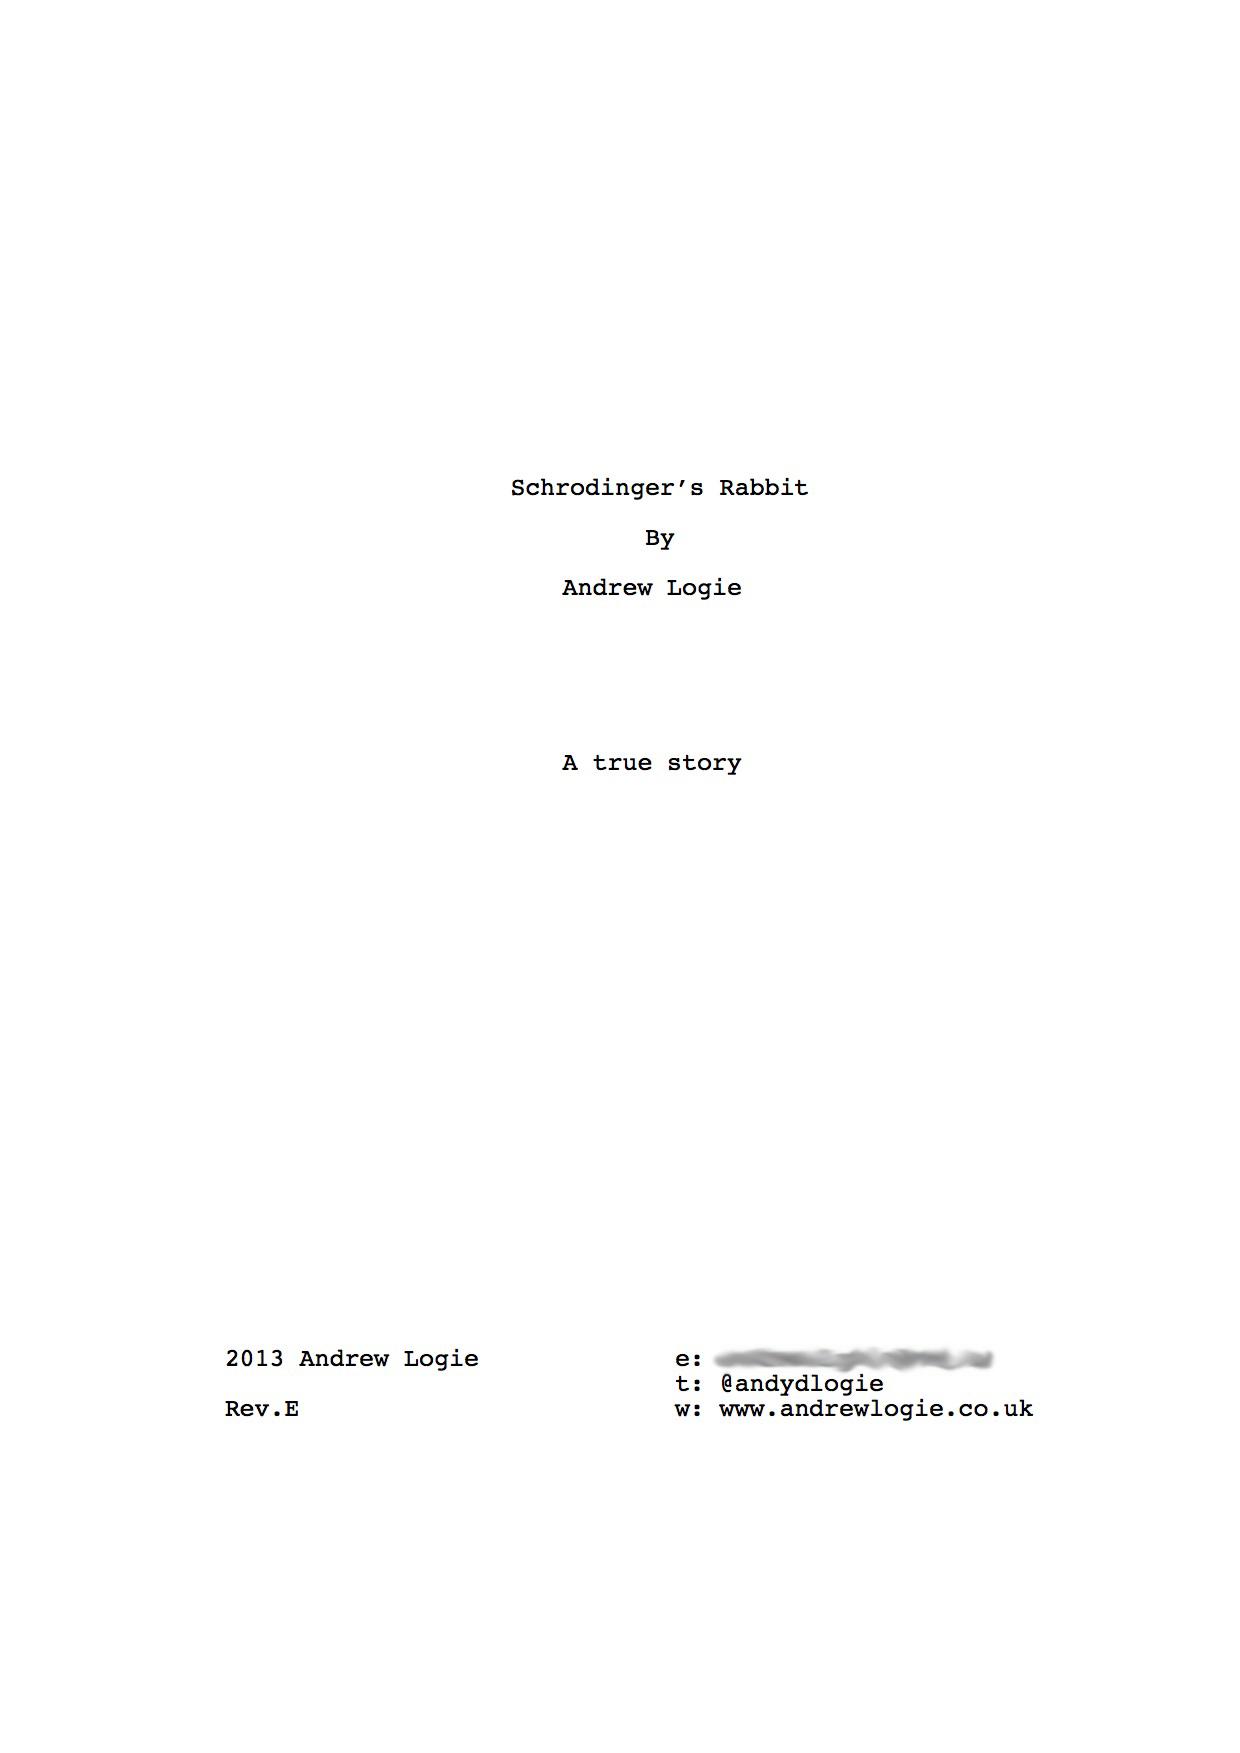 Schrodinger s rabbit final script andrewlogie